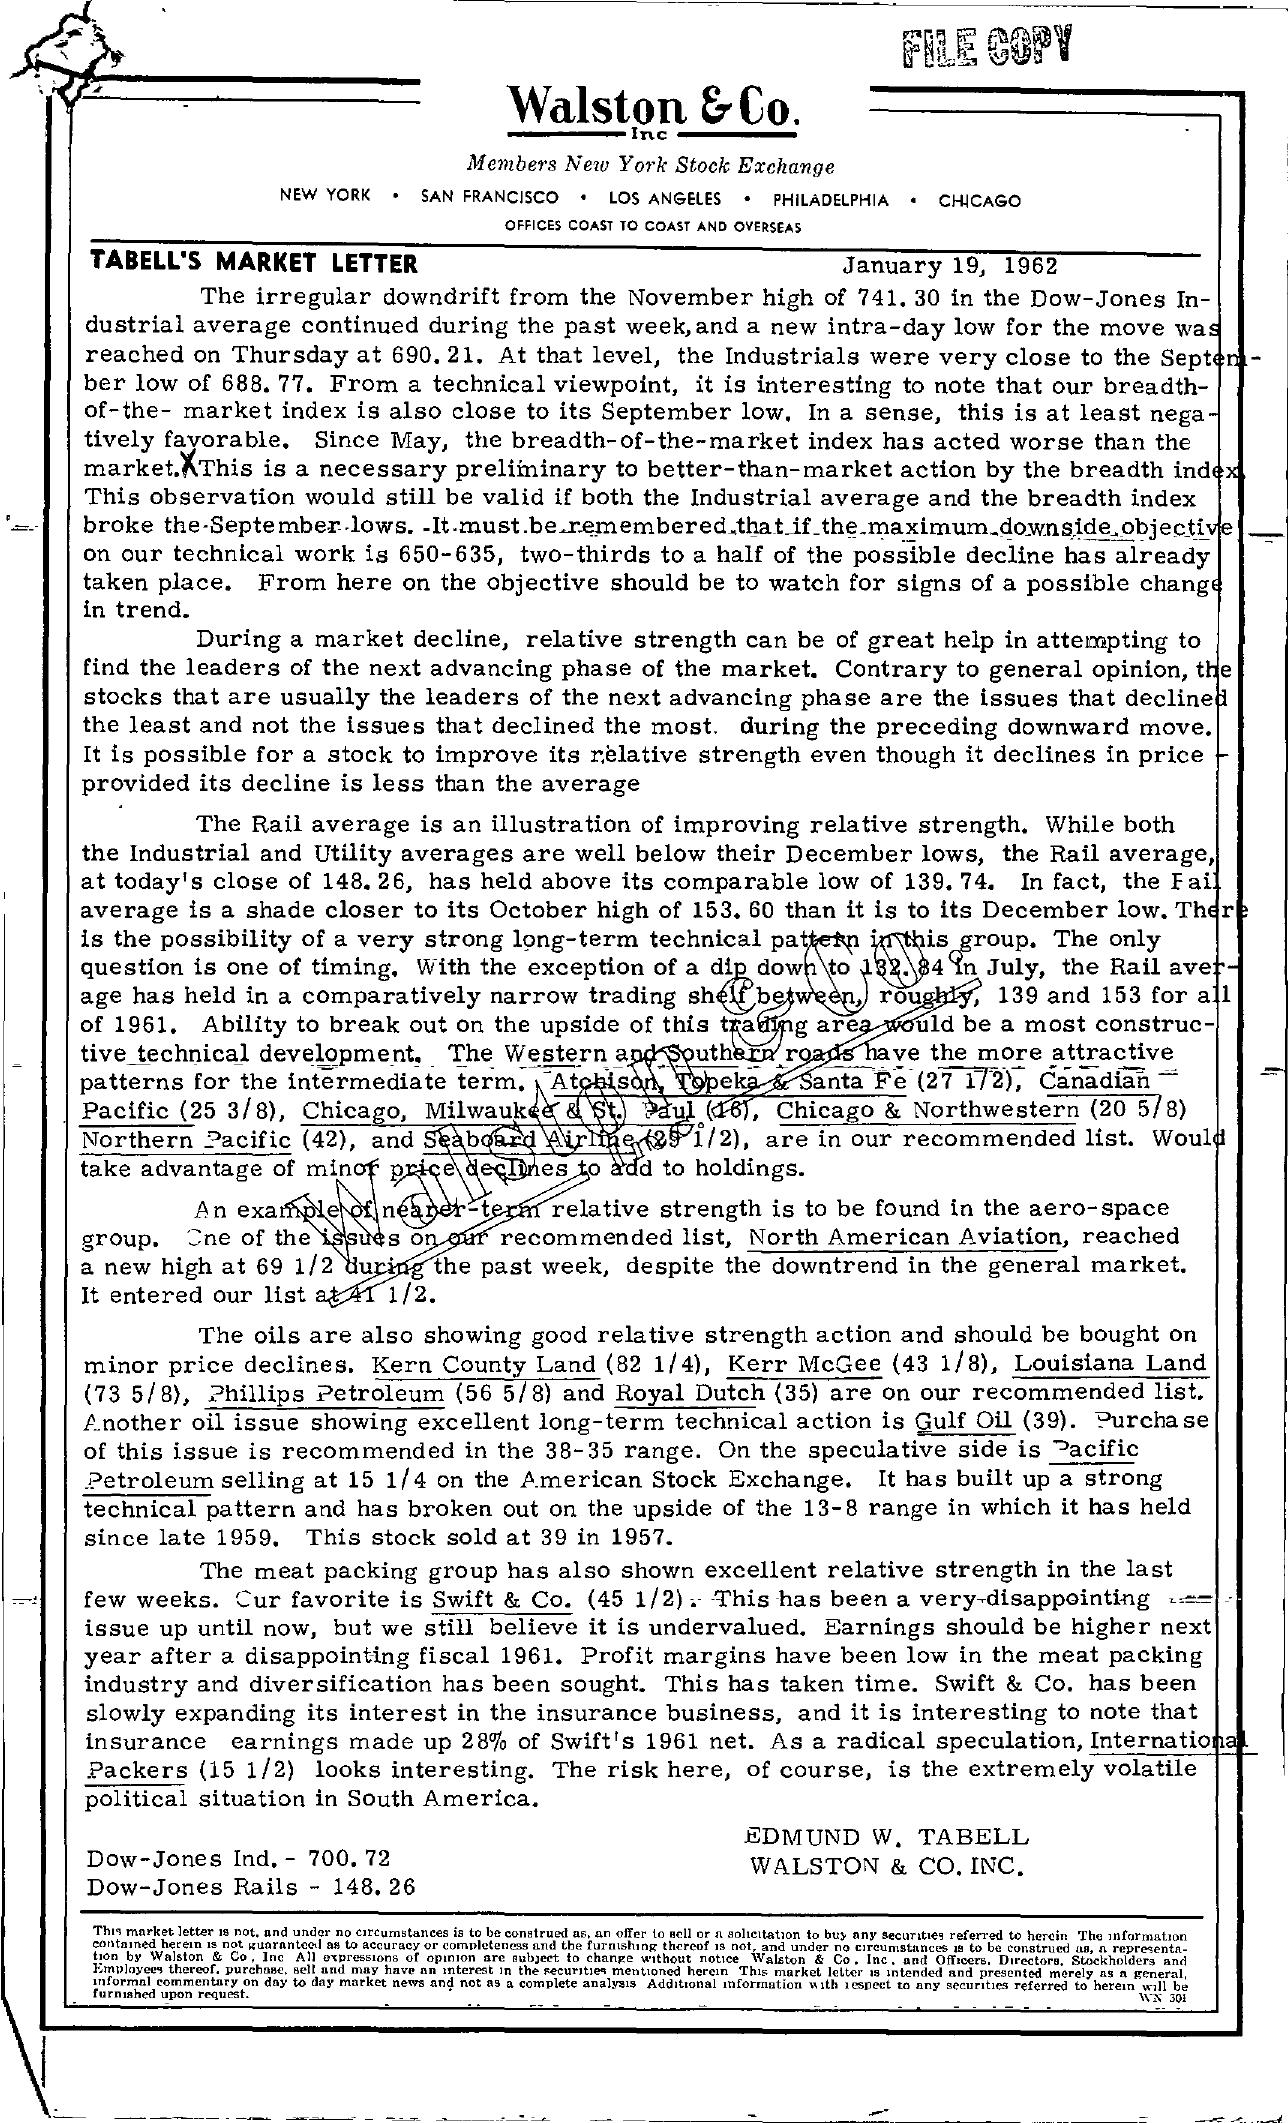 Tabell's Market Letter - January 19, 1962